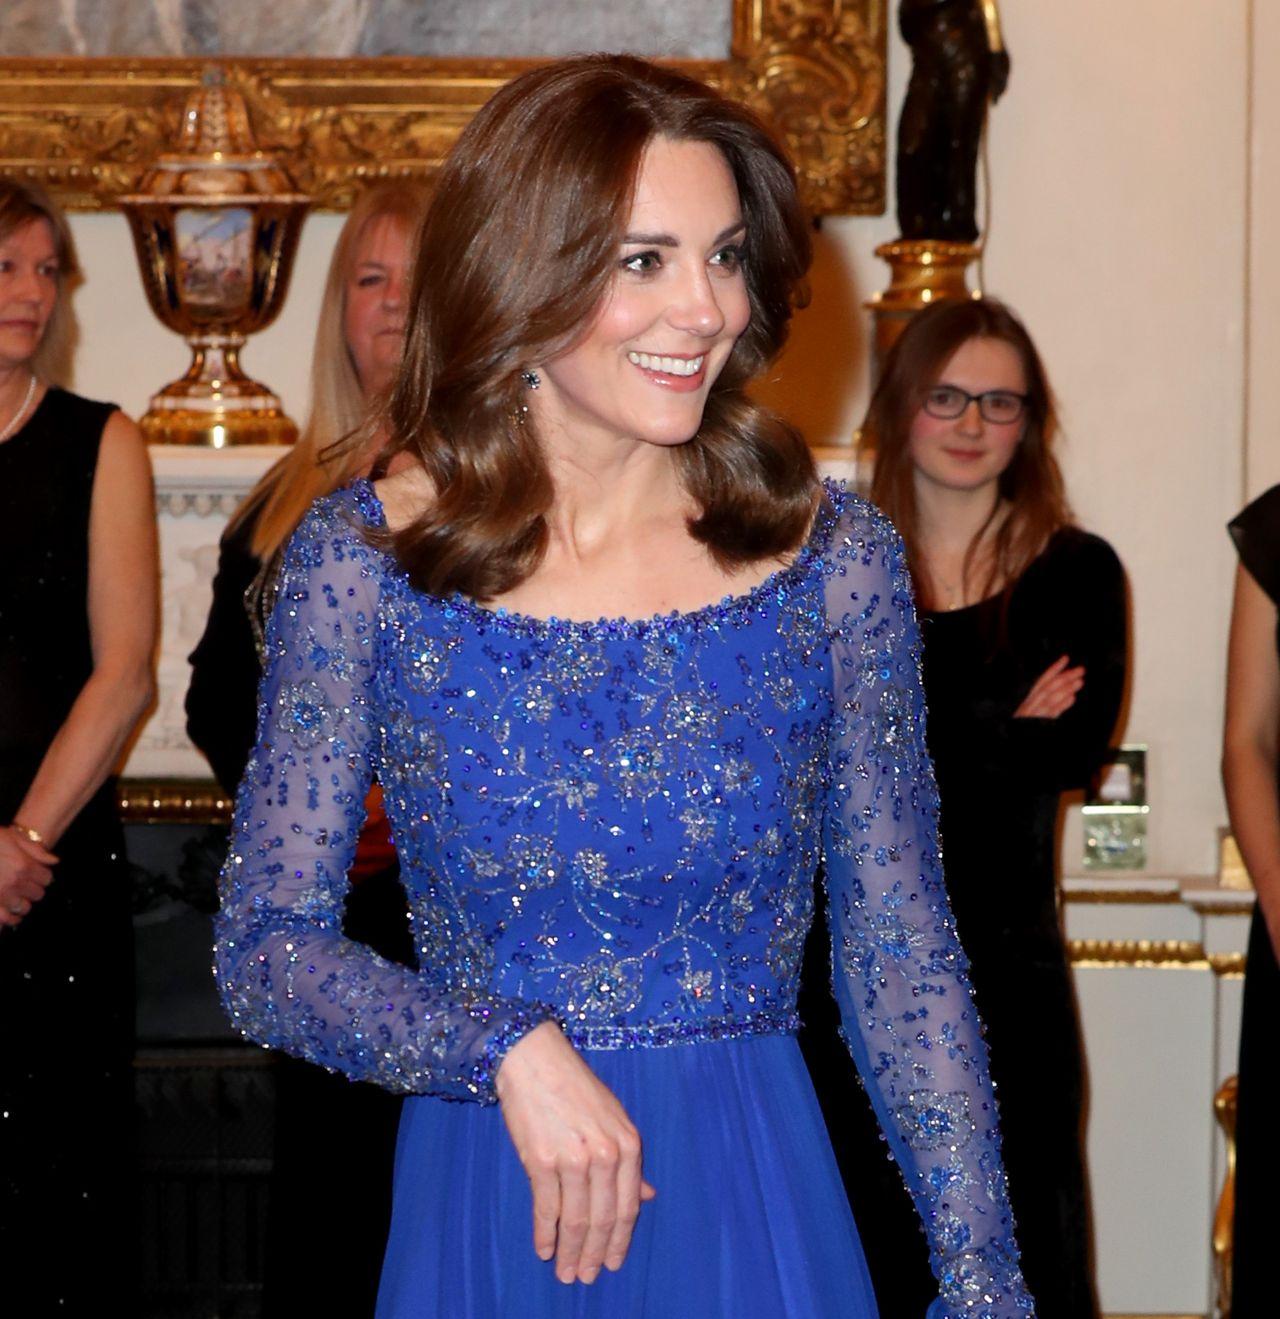 Księżna Kate w chabrowej sukience